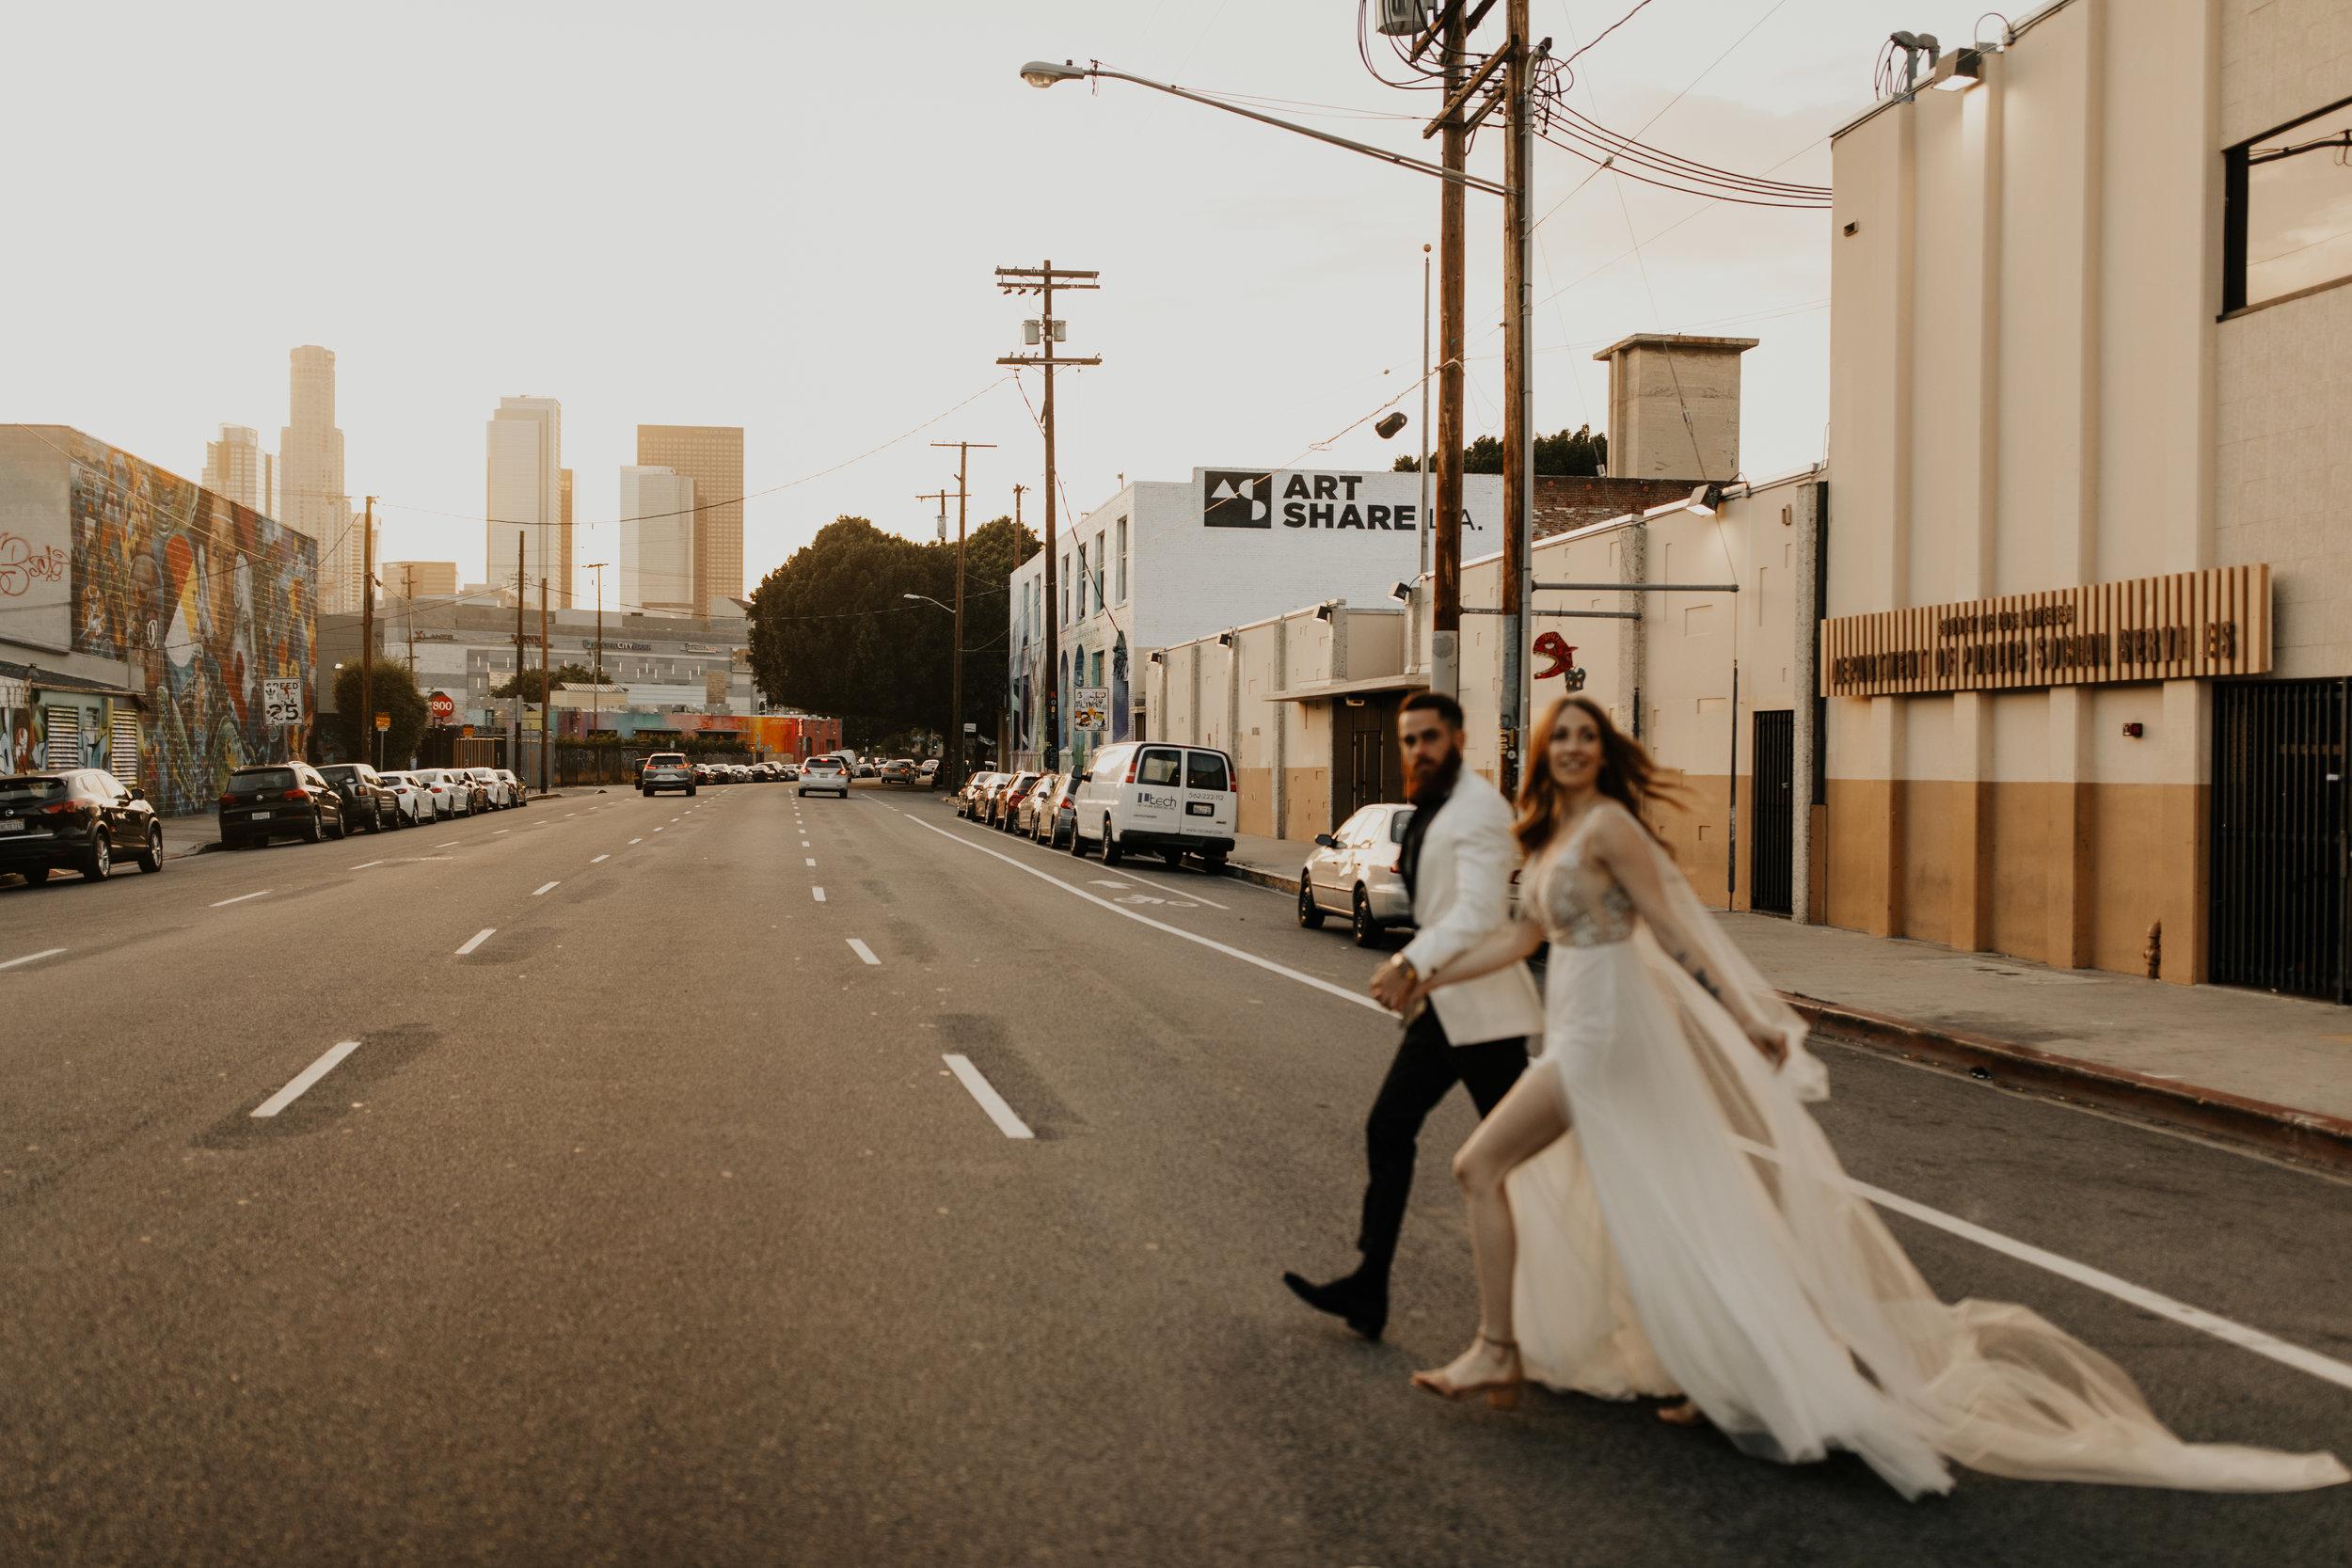 Downtown-LA-Wedding-MeganandRonny-478.jpg